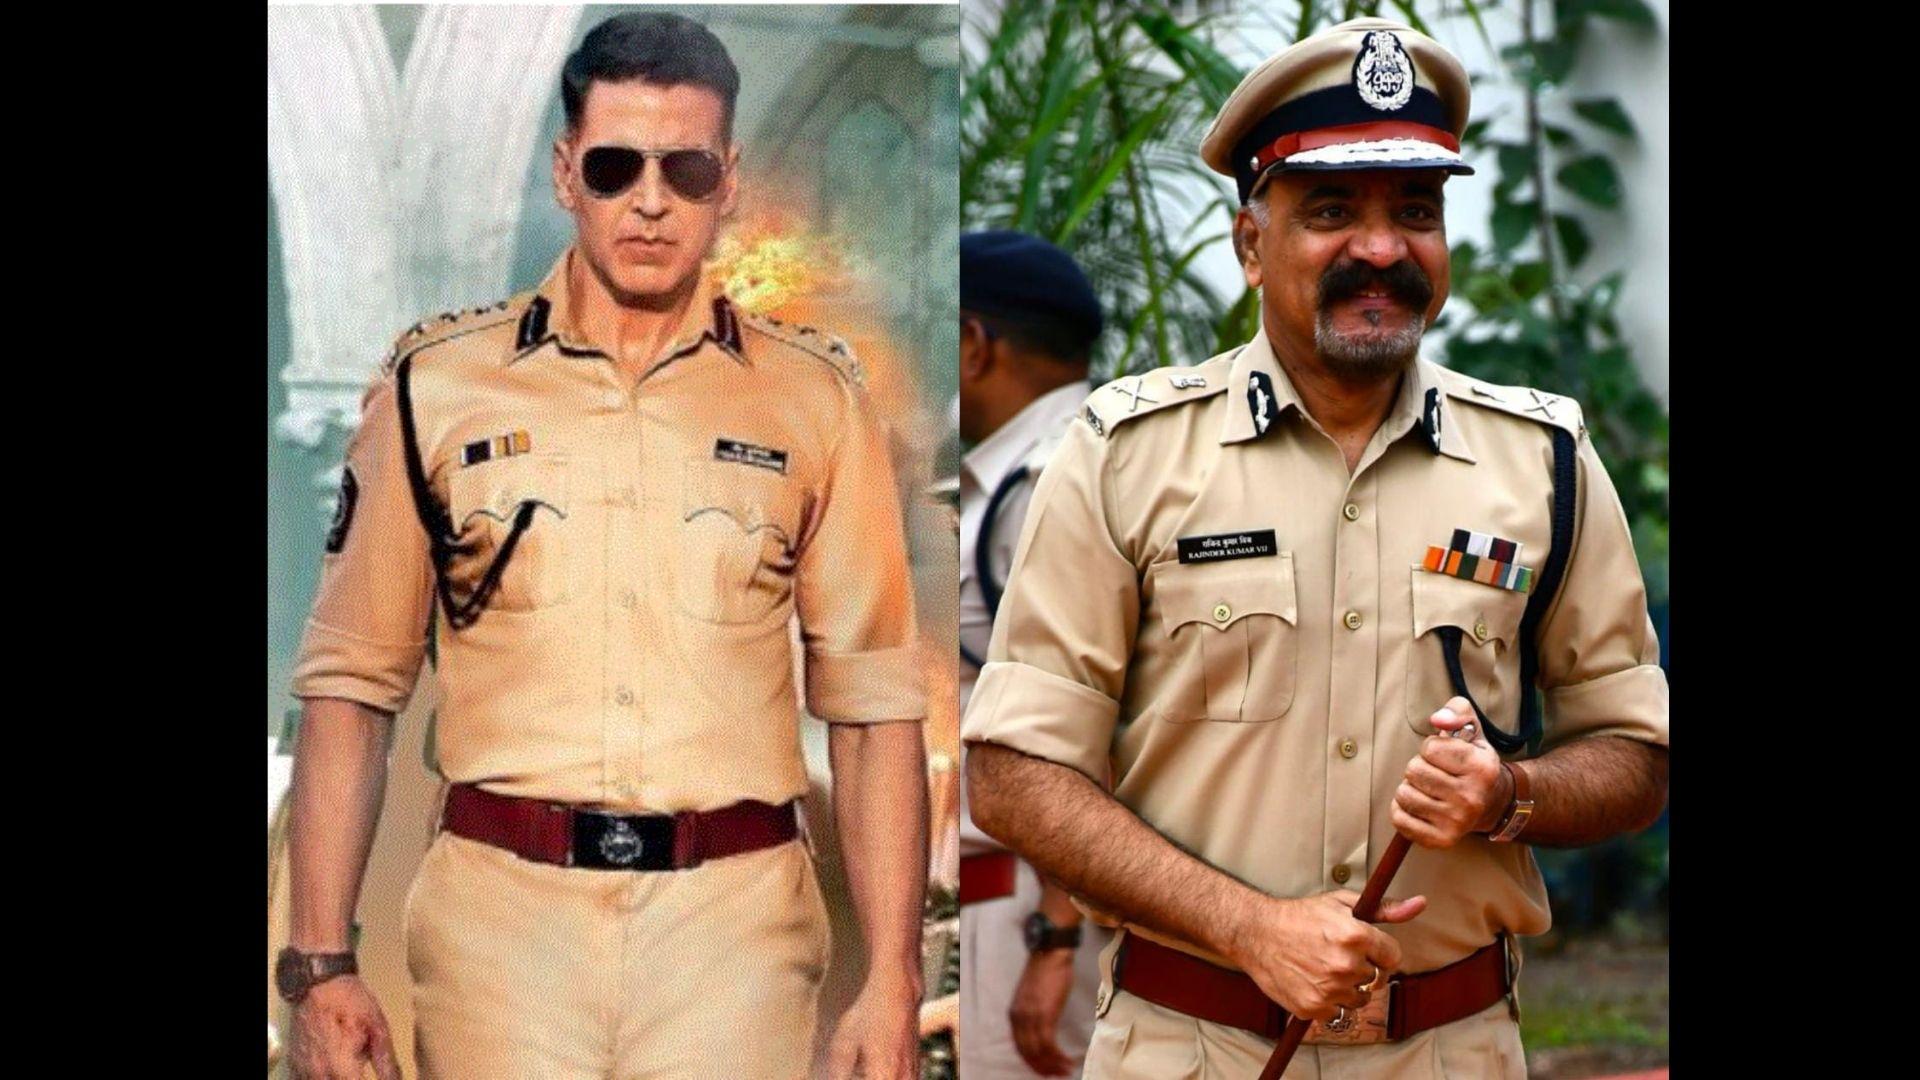 Sooryavanshi: Akshay Kumar's BTS Picture Error Gets Pointed Out By DGP RK Vij; Actor Clears The Air